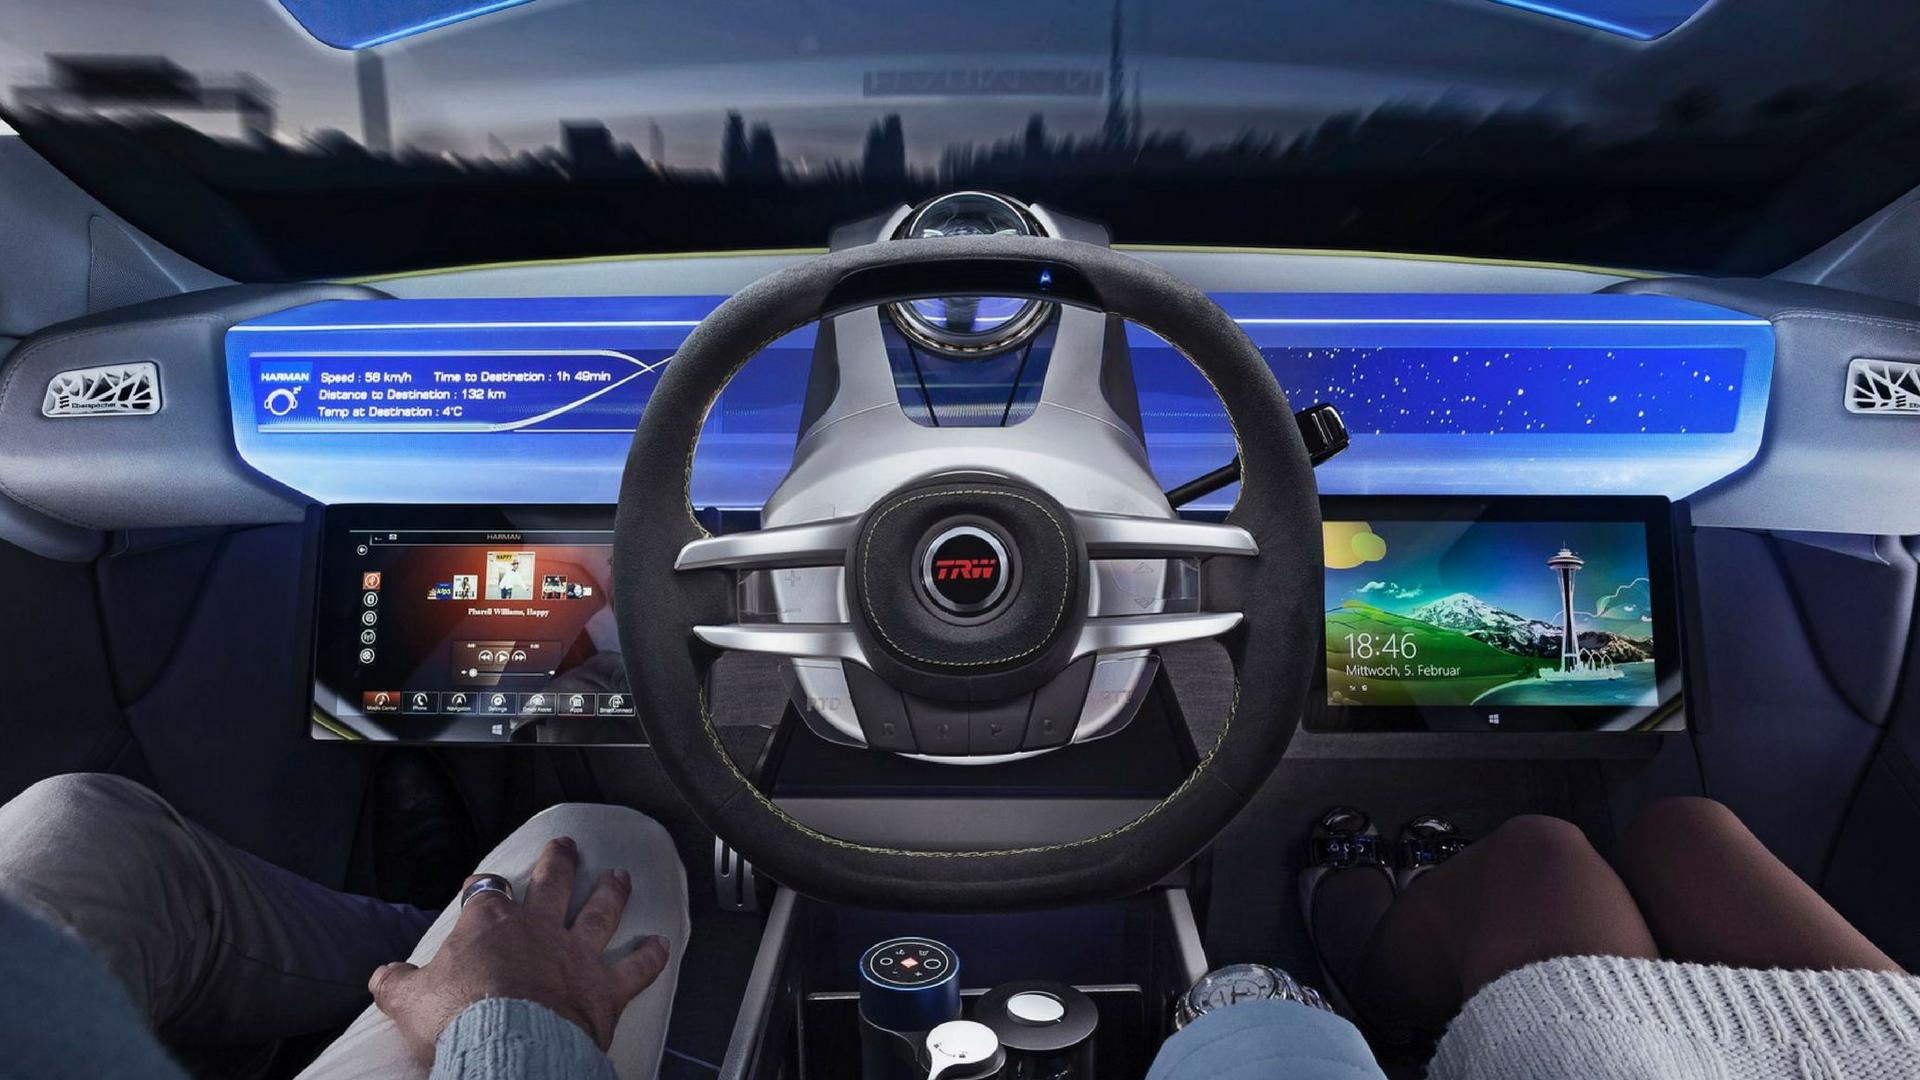 Why DJs Should Fear Driverless Cars